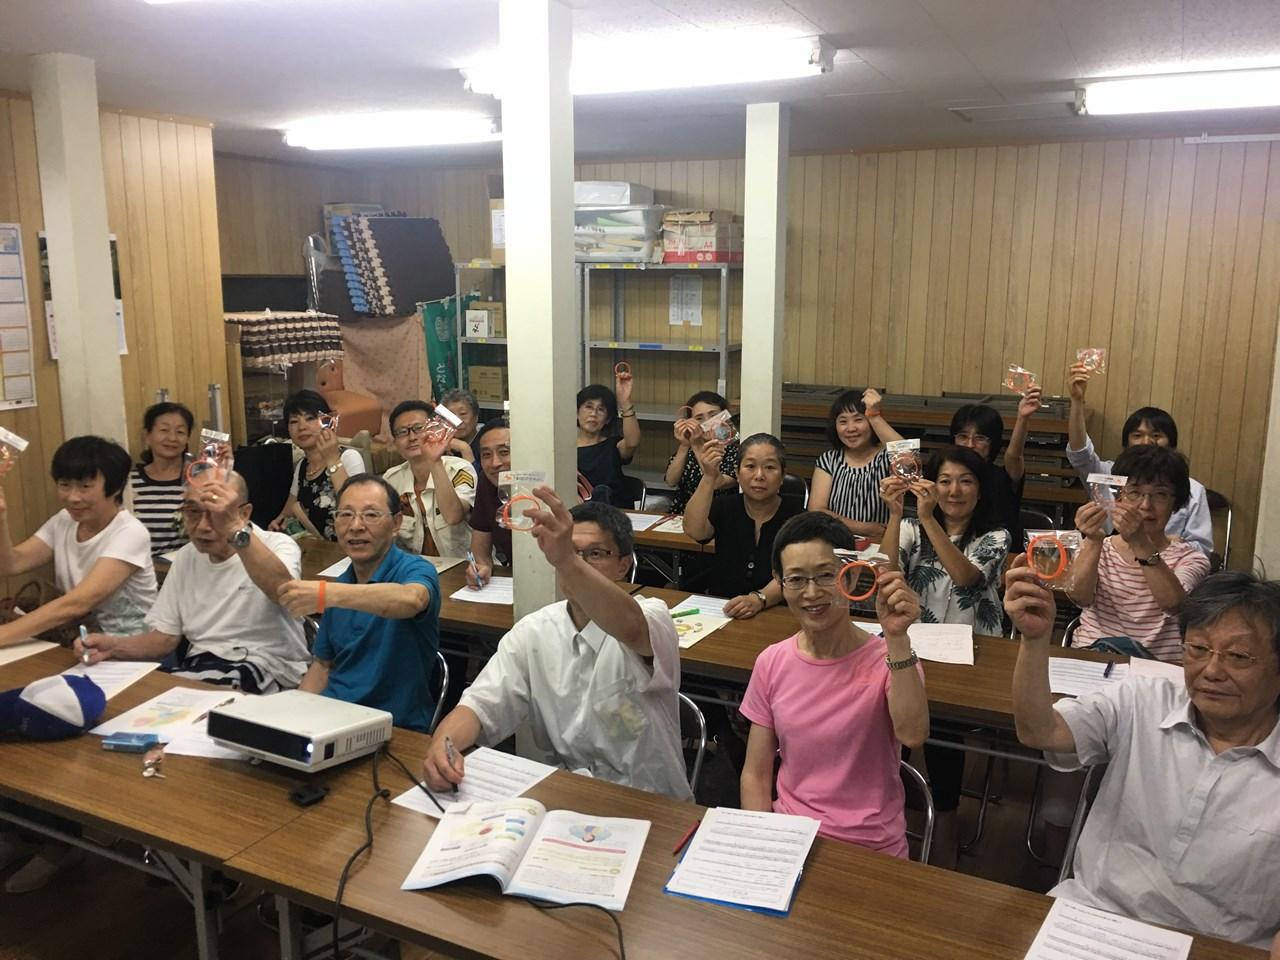 State of dementia supporter training course of Rokukakubashi mall